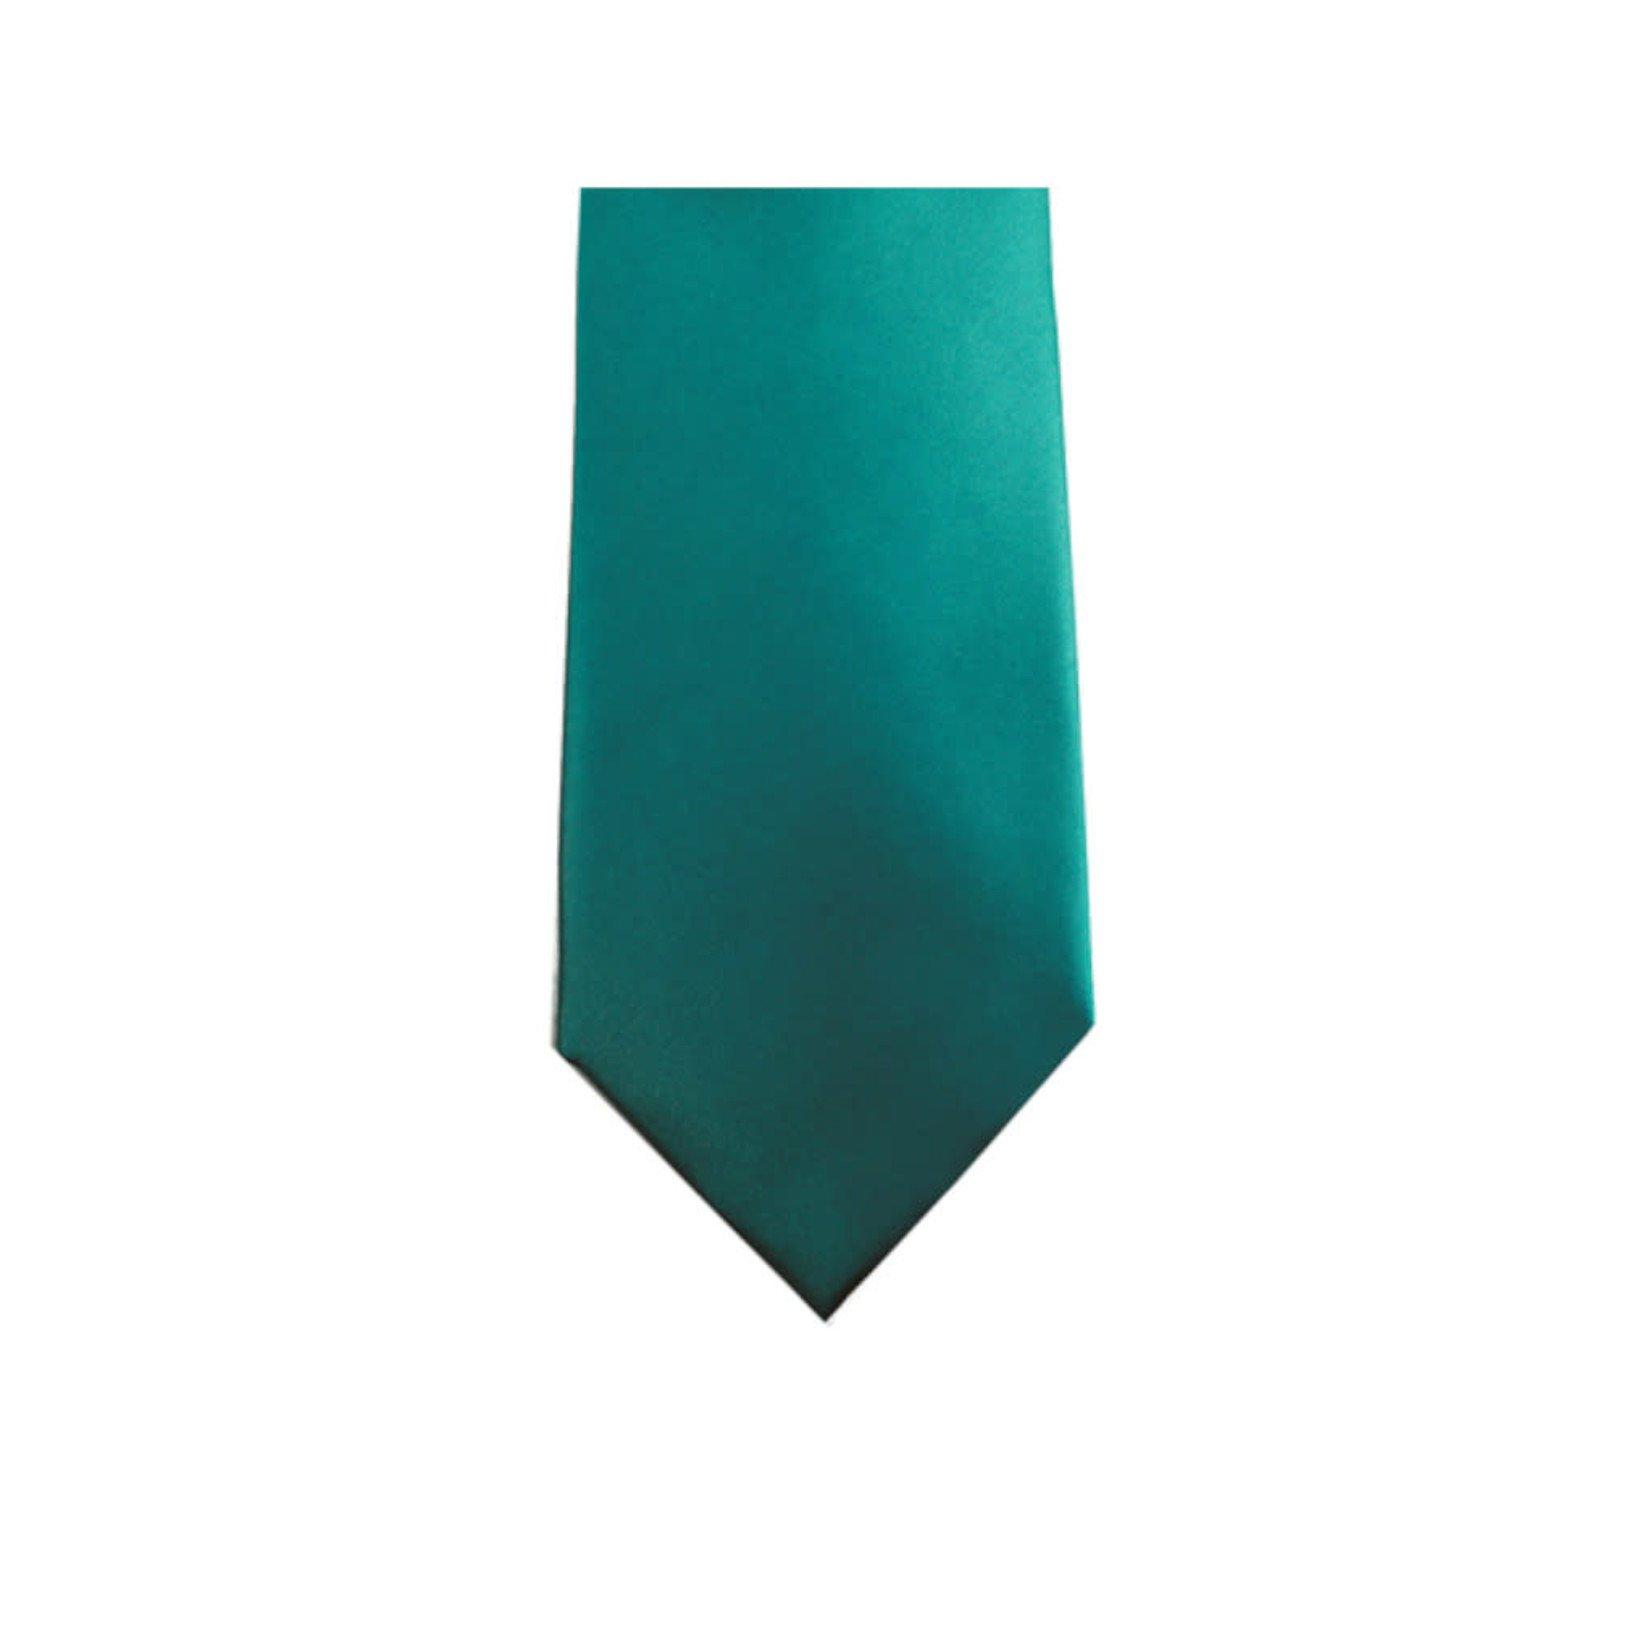 Knotz M100-36 Solid Mint Tie